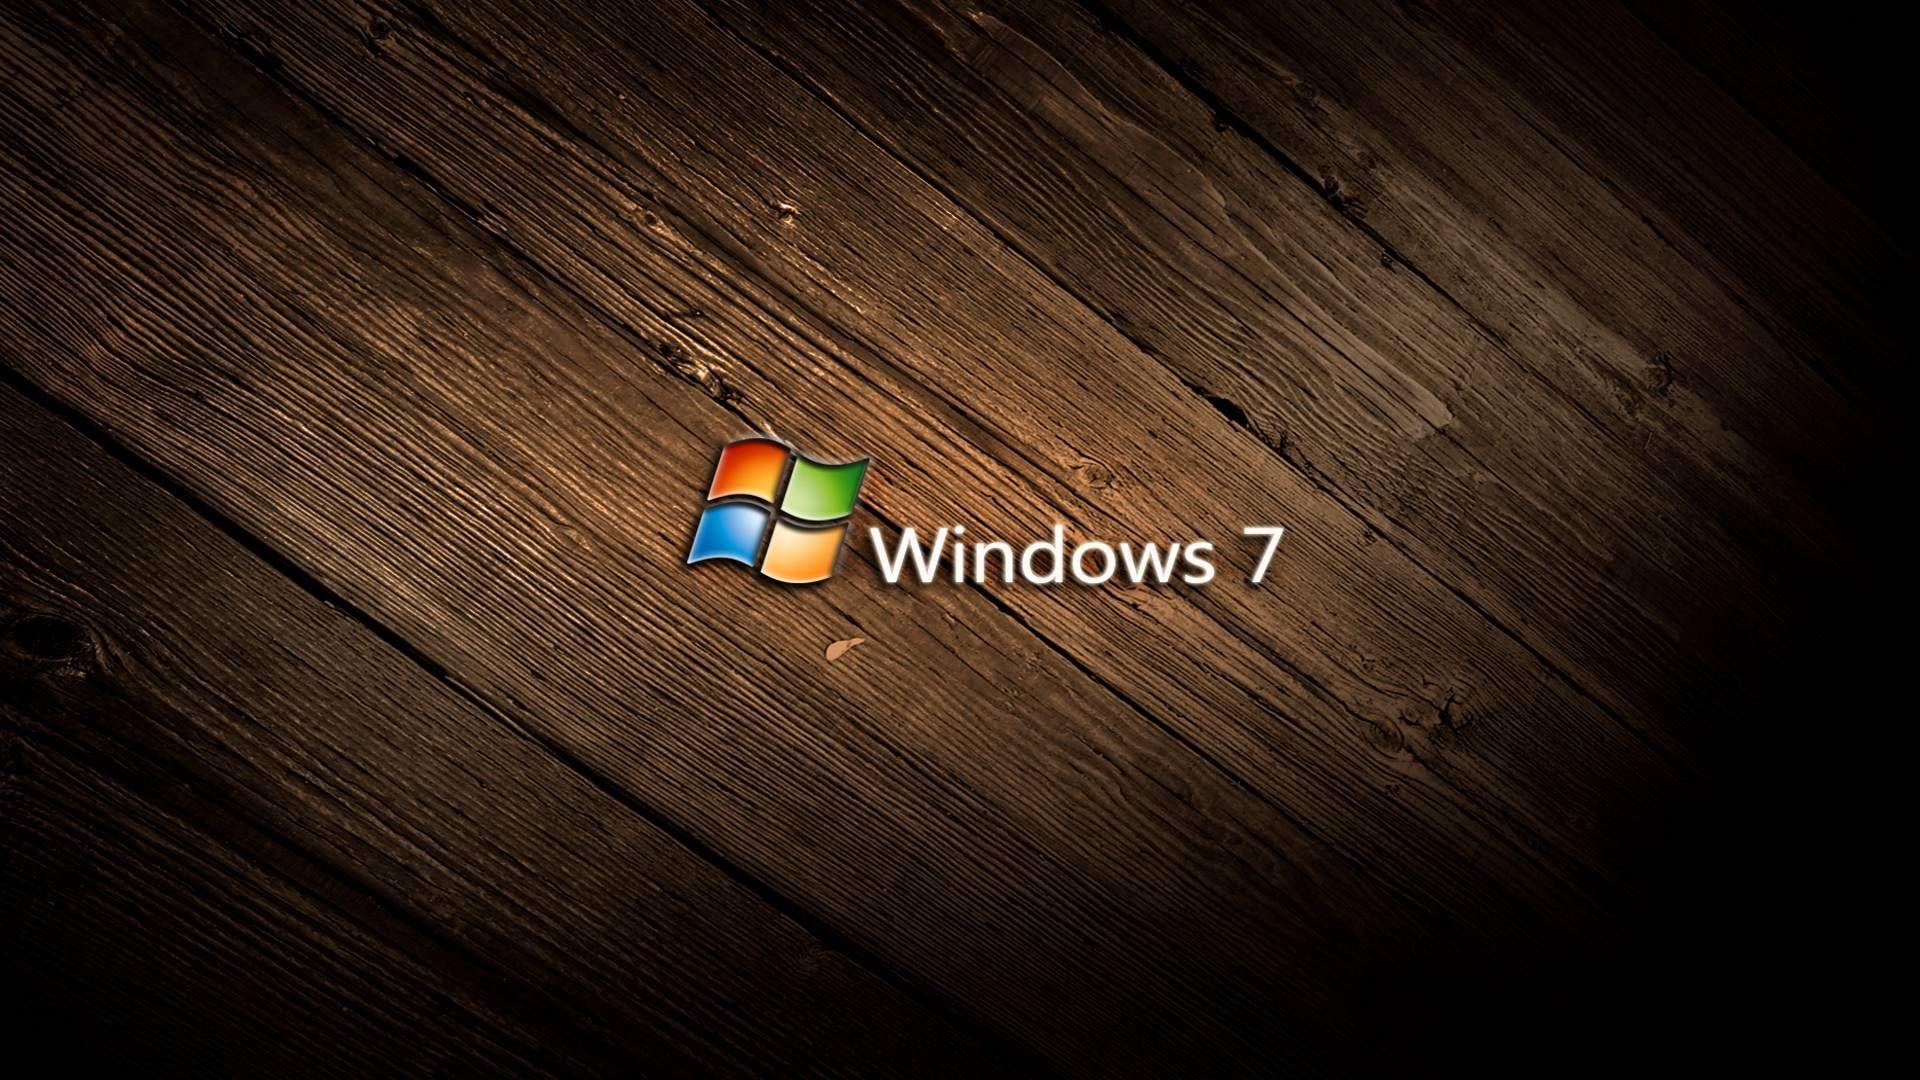 Desktop Backgrounds For Windows - Window 7 Wallpaper 3d - HD Wallpaper